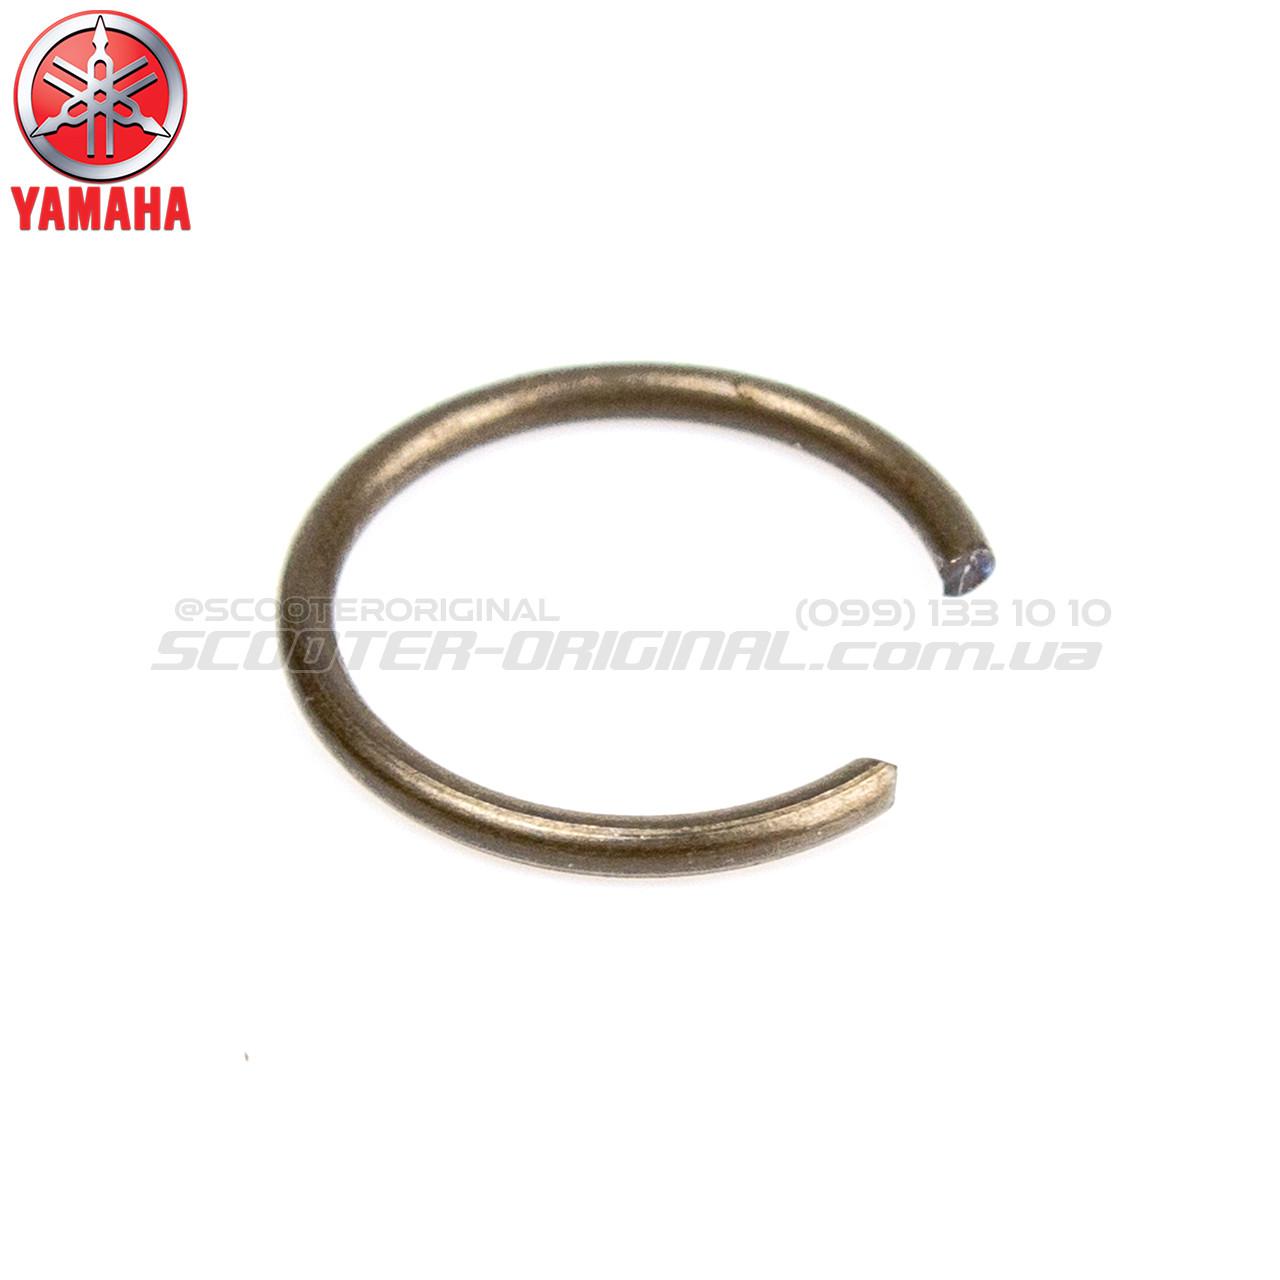 Стопорное кольцо оригинал YAMAHA OEM Ø 10 мм